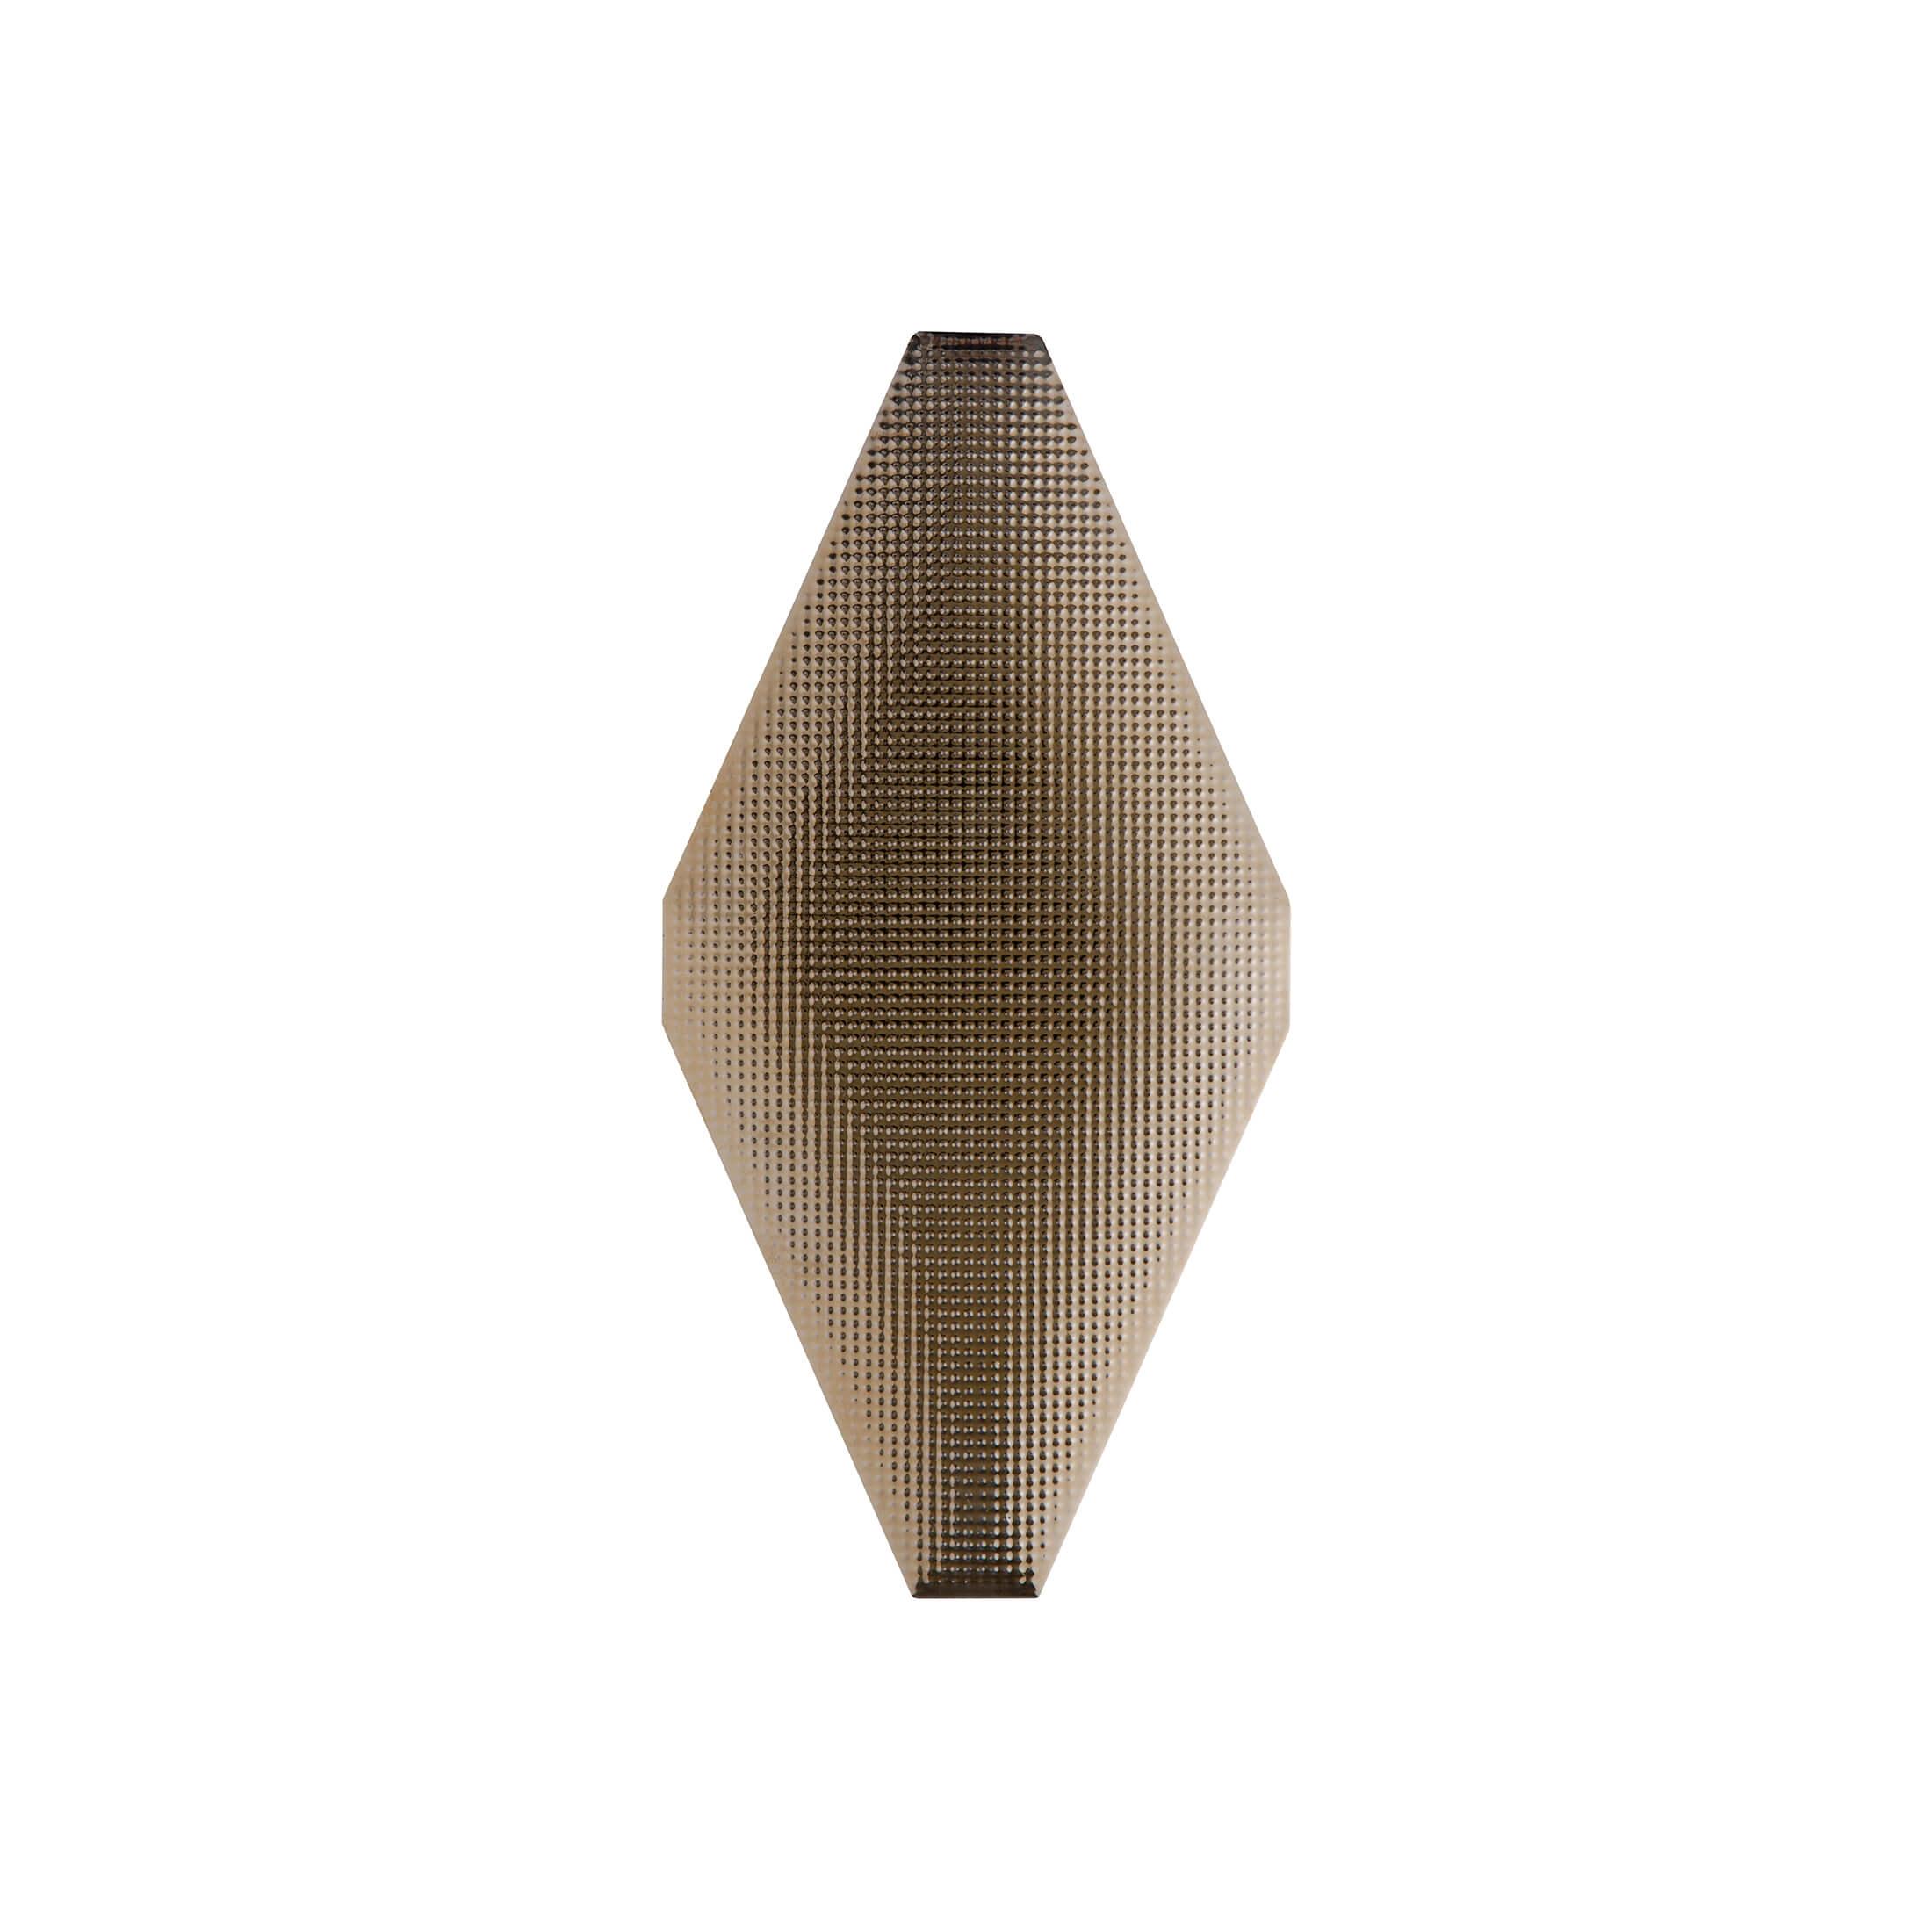 ADNE8125 - ROMBO ACOLCHADO ORO VIEJO - 10 cm X 20 cm